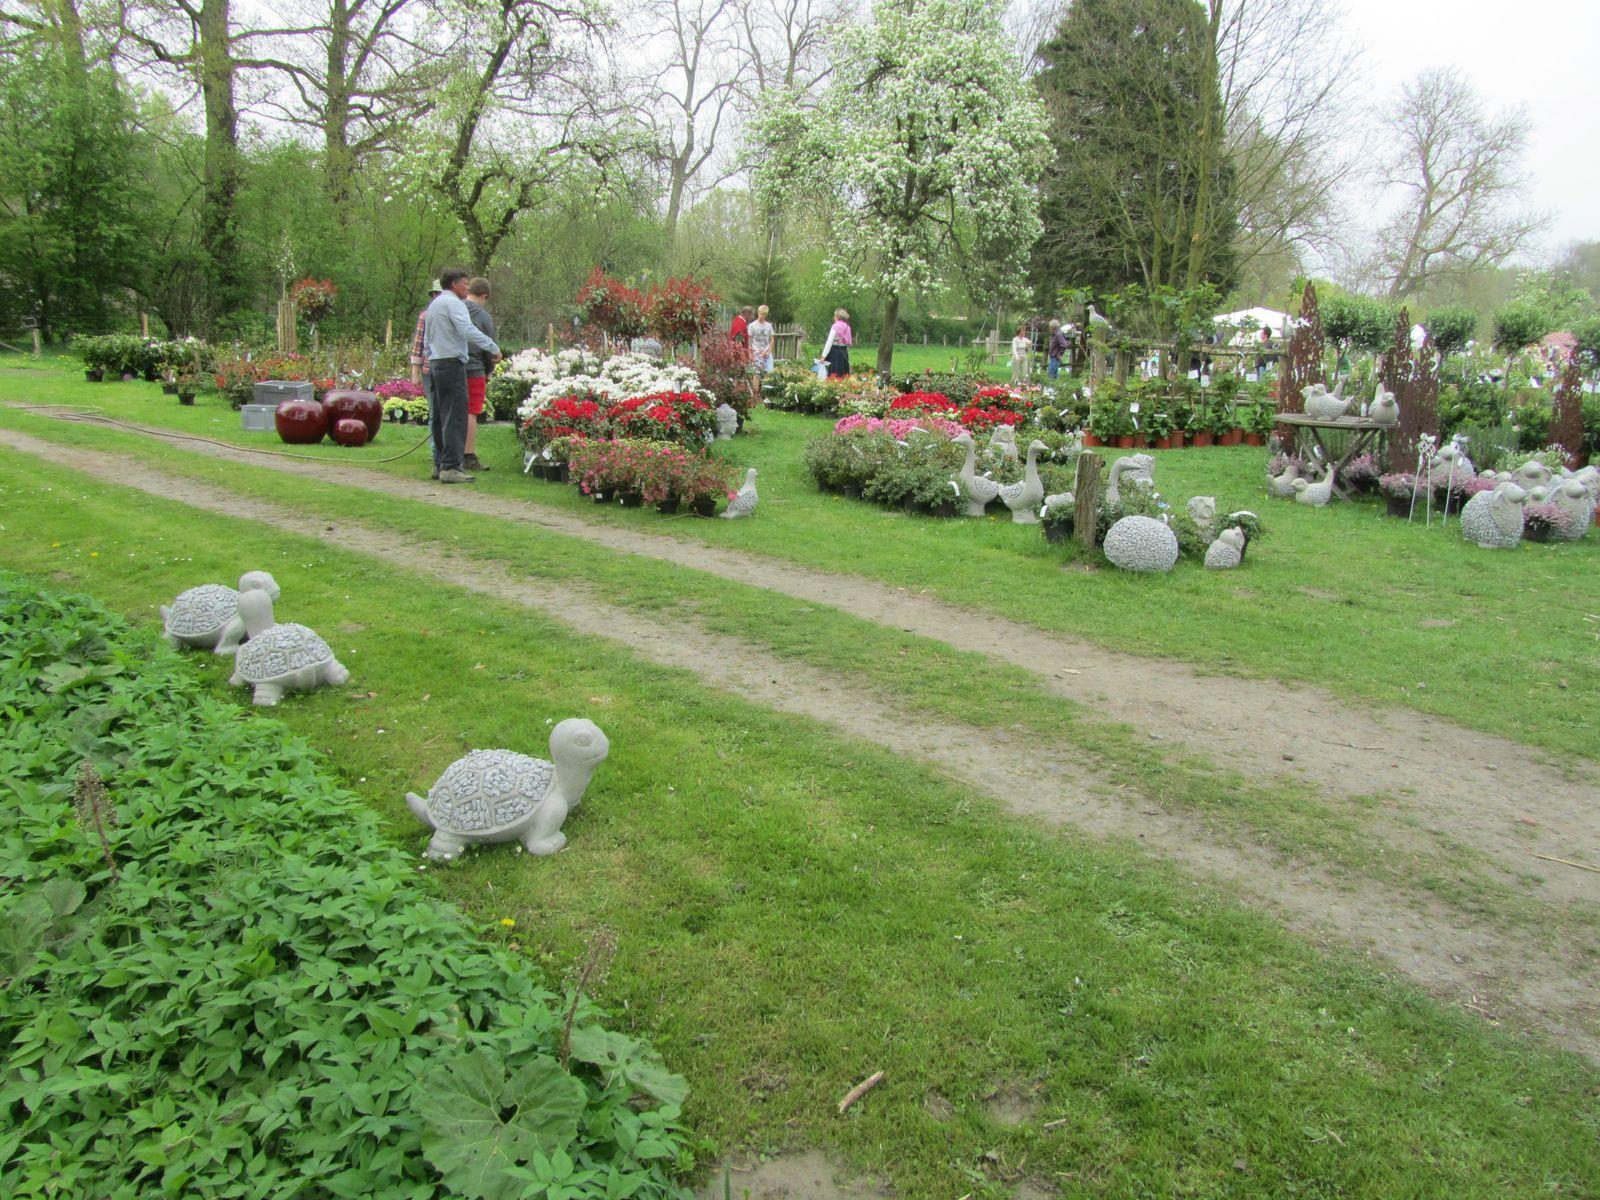 Les Jardins de l'Abbaye d'Aywiers en Belgique